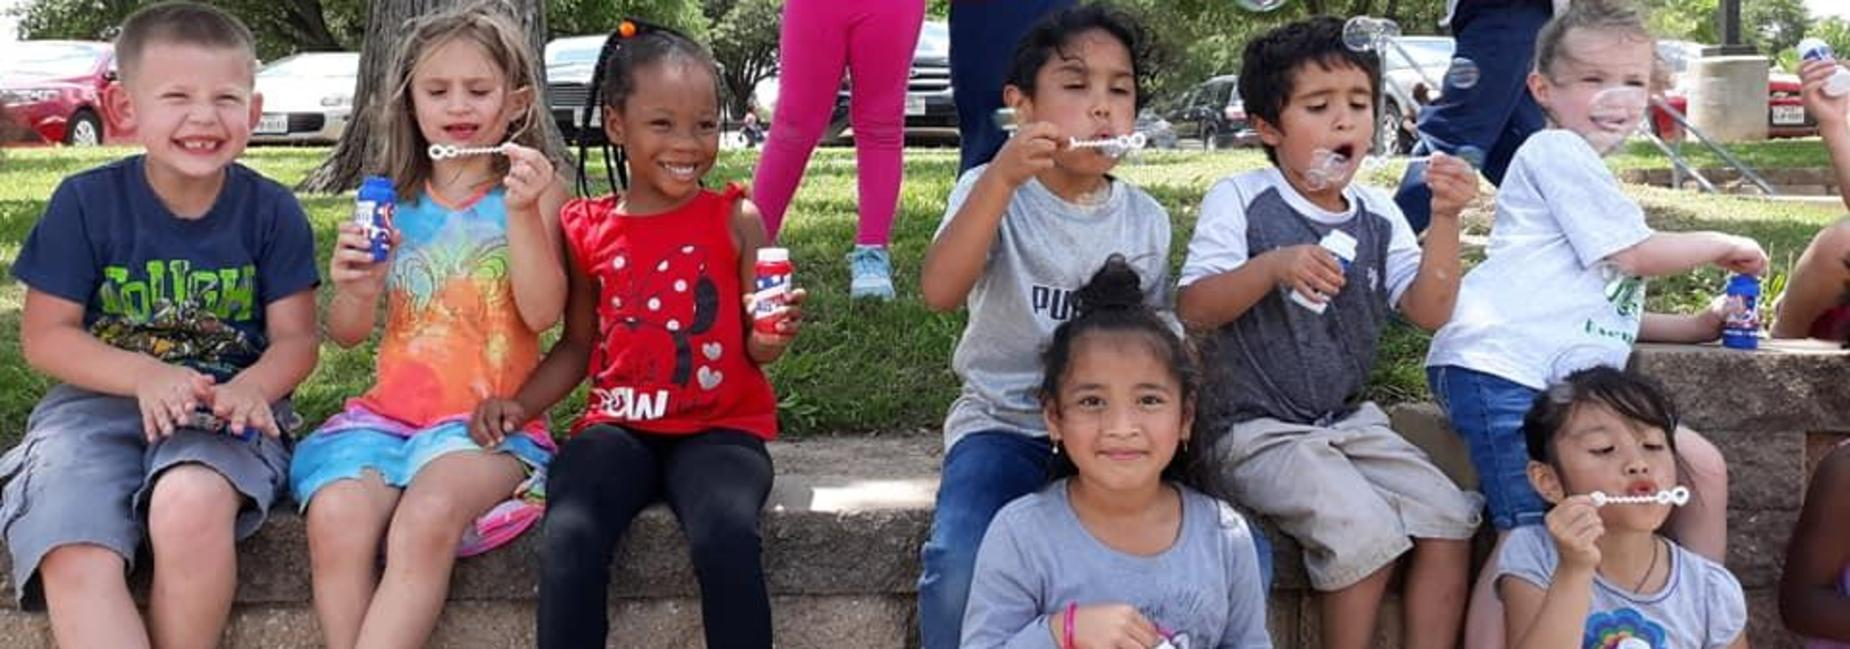 Kids enjoying snow-cones & bubbles